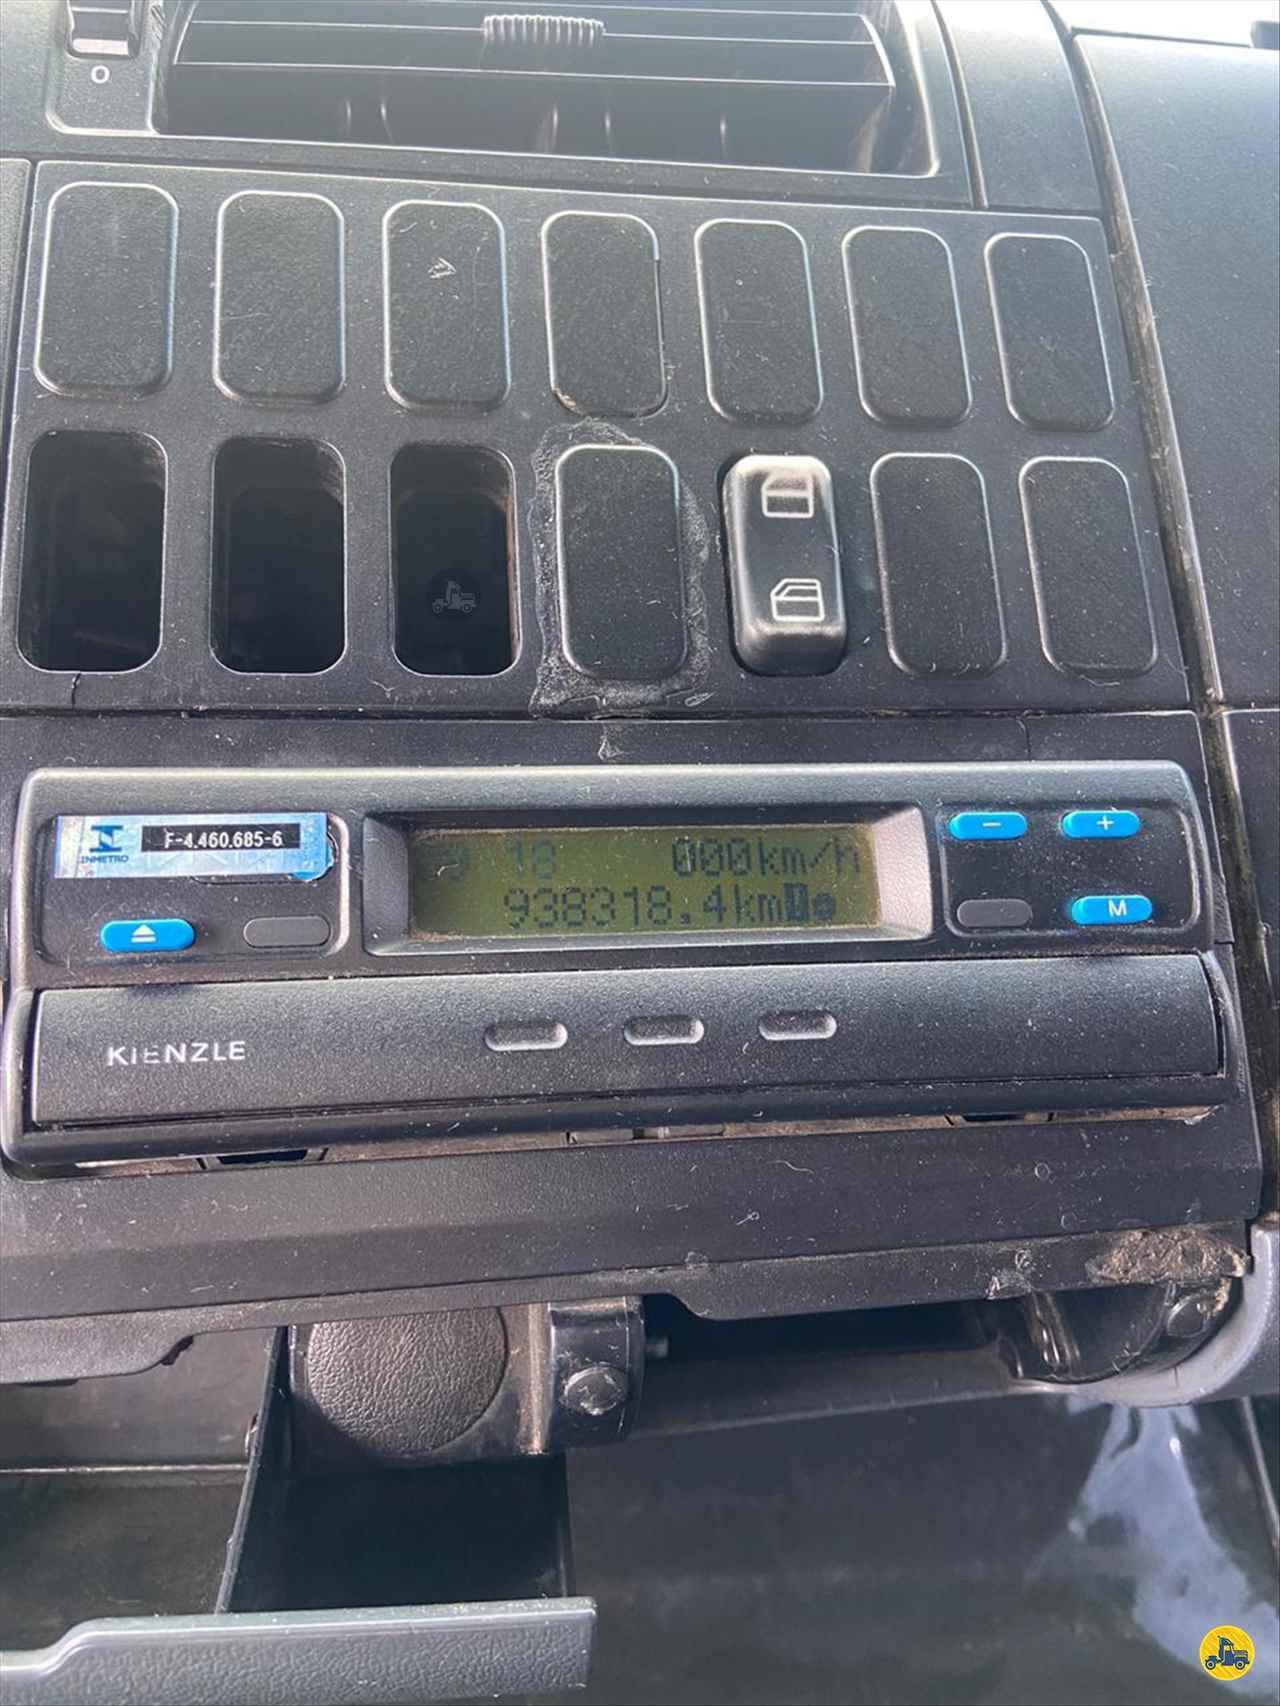 MERCEDES-BENZ MB 1938 938000km 2003/2003 Gegê Caminhões